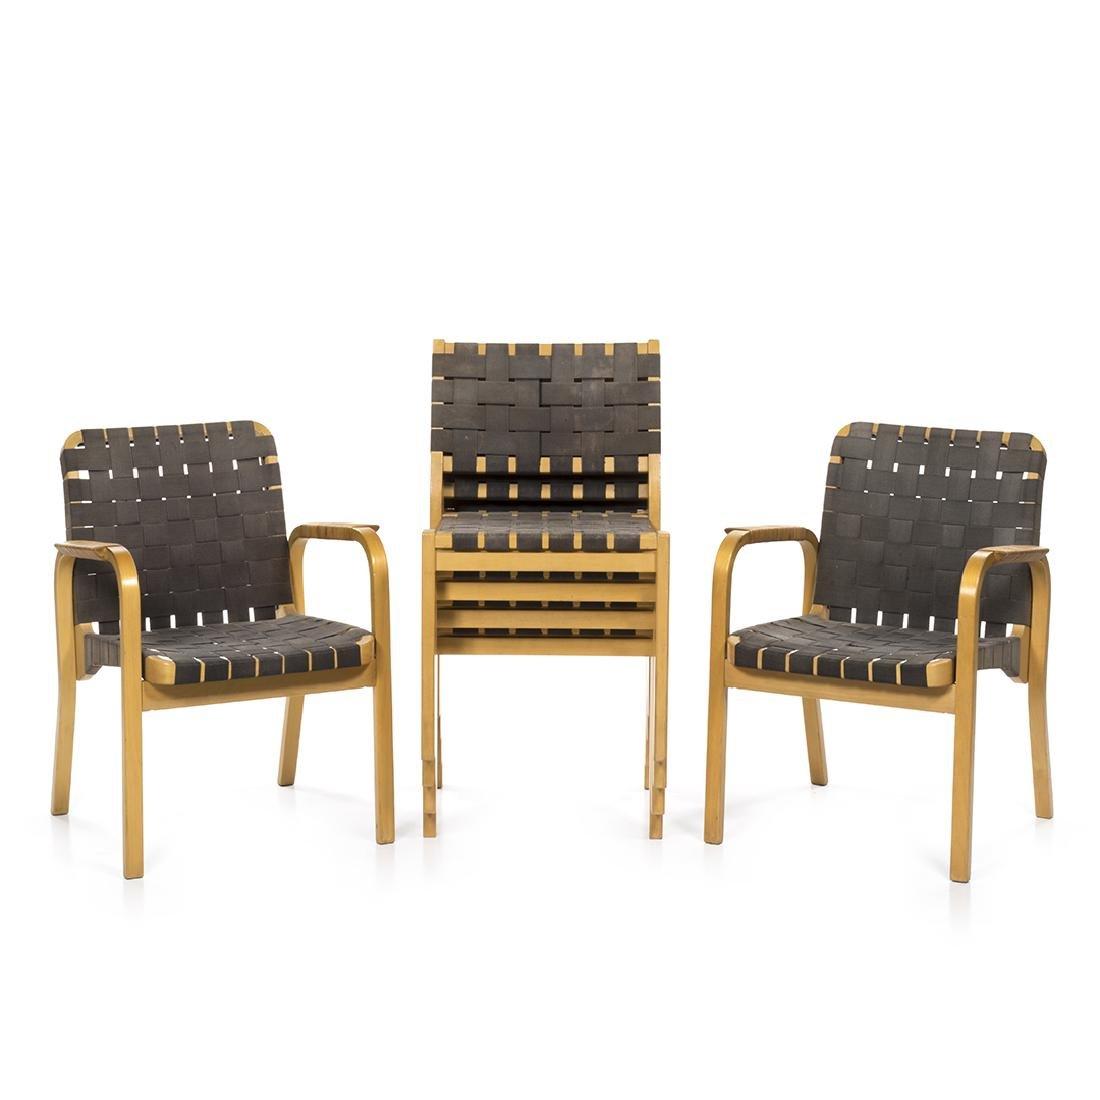 Alvar Aalto Model 611 Chairs (6)